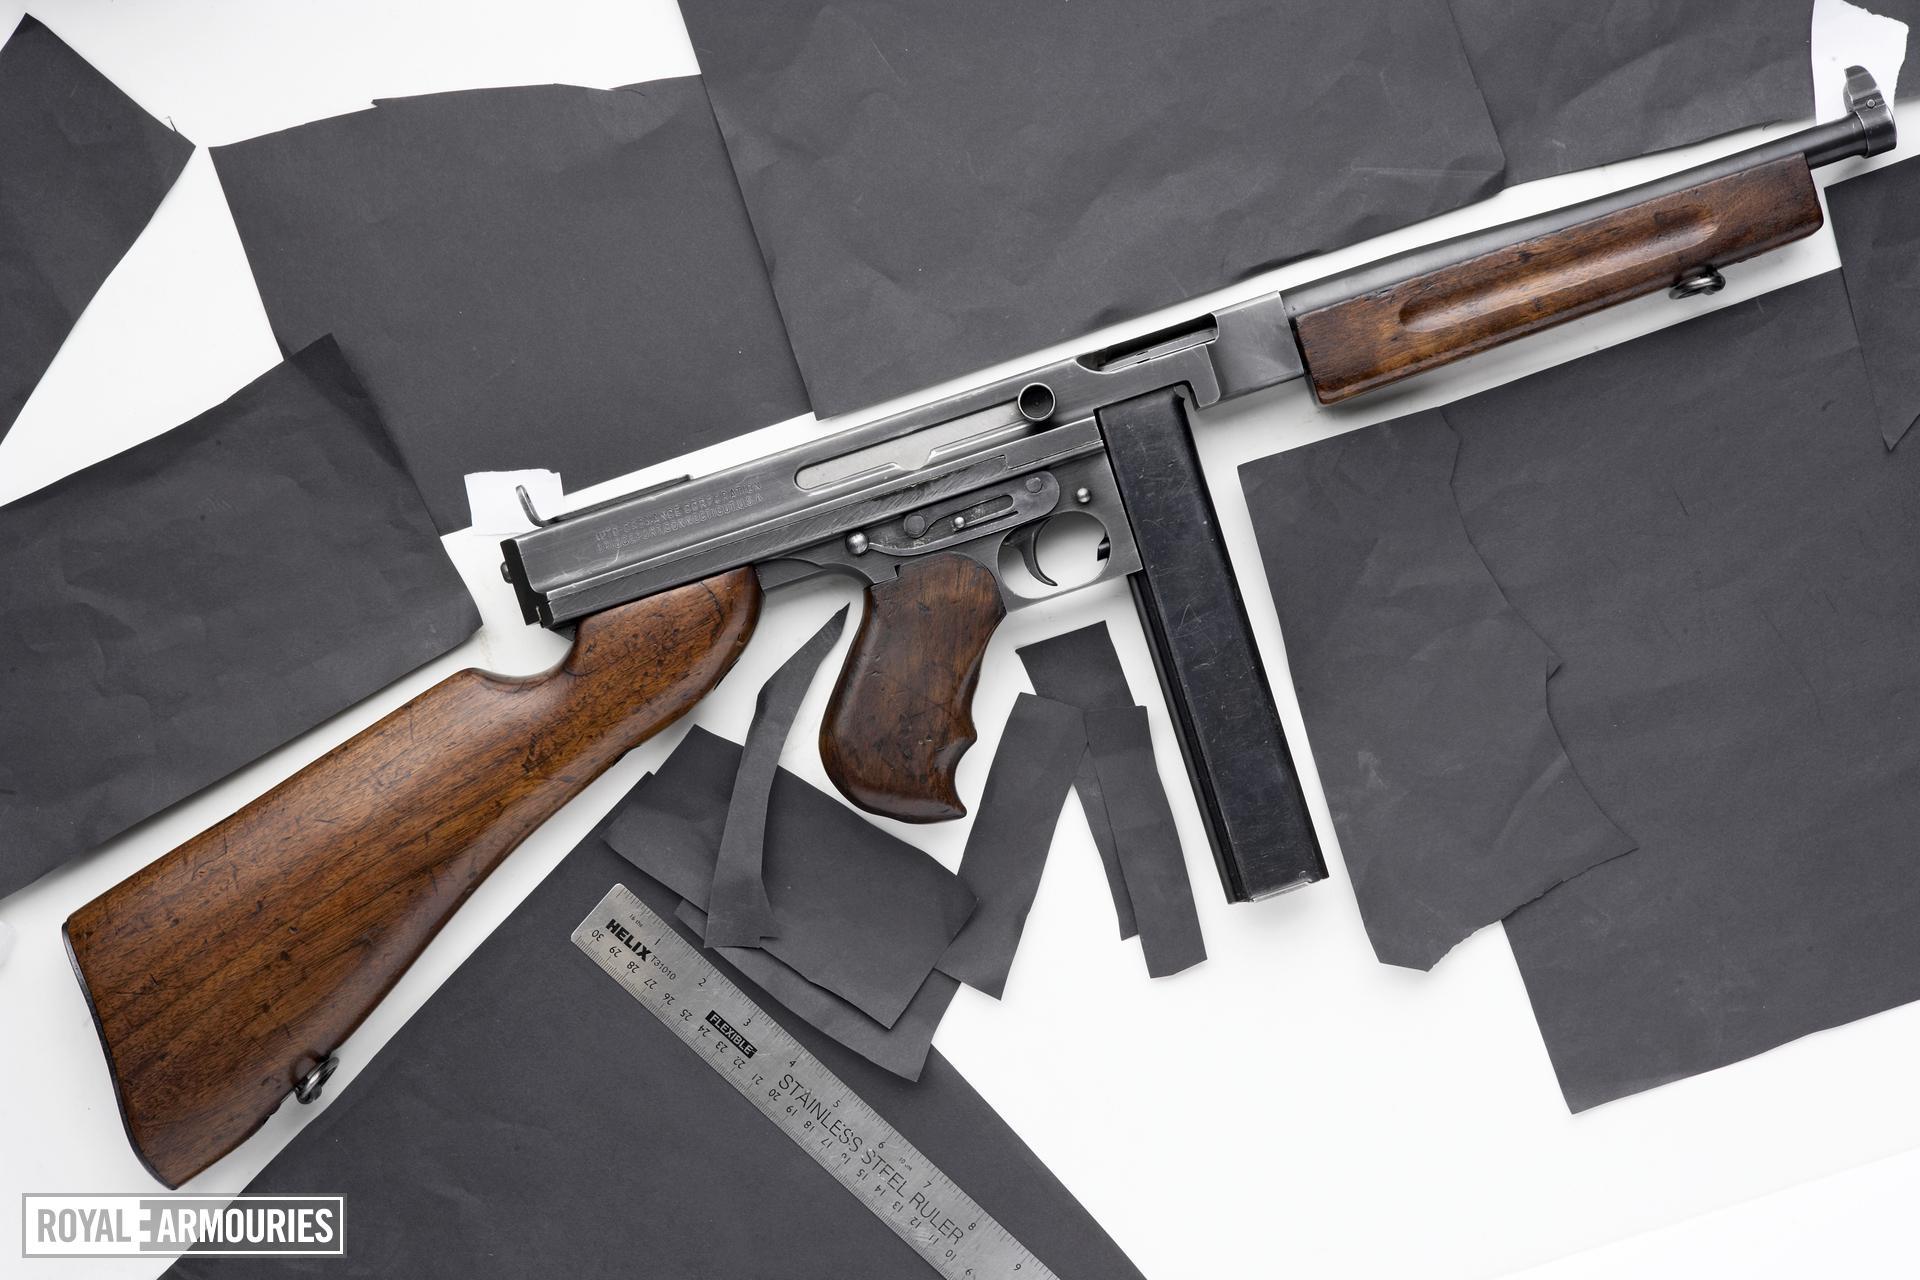 Centrefire automatic submachine gun - Thompson M1